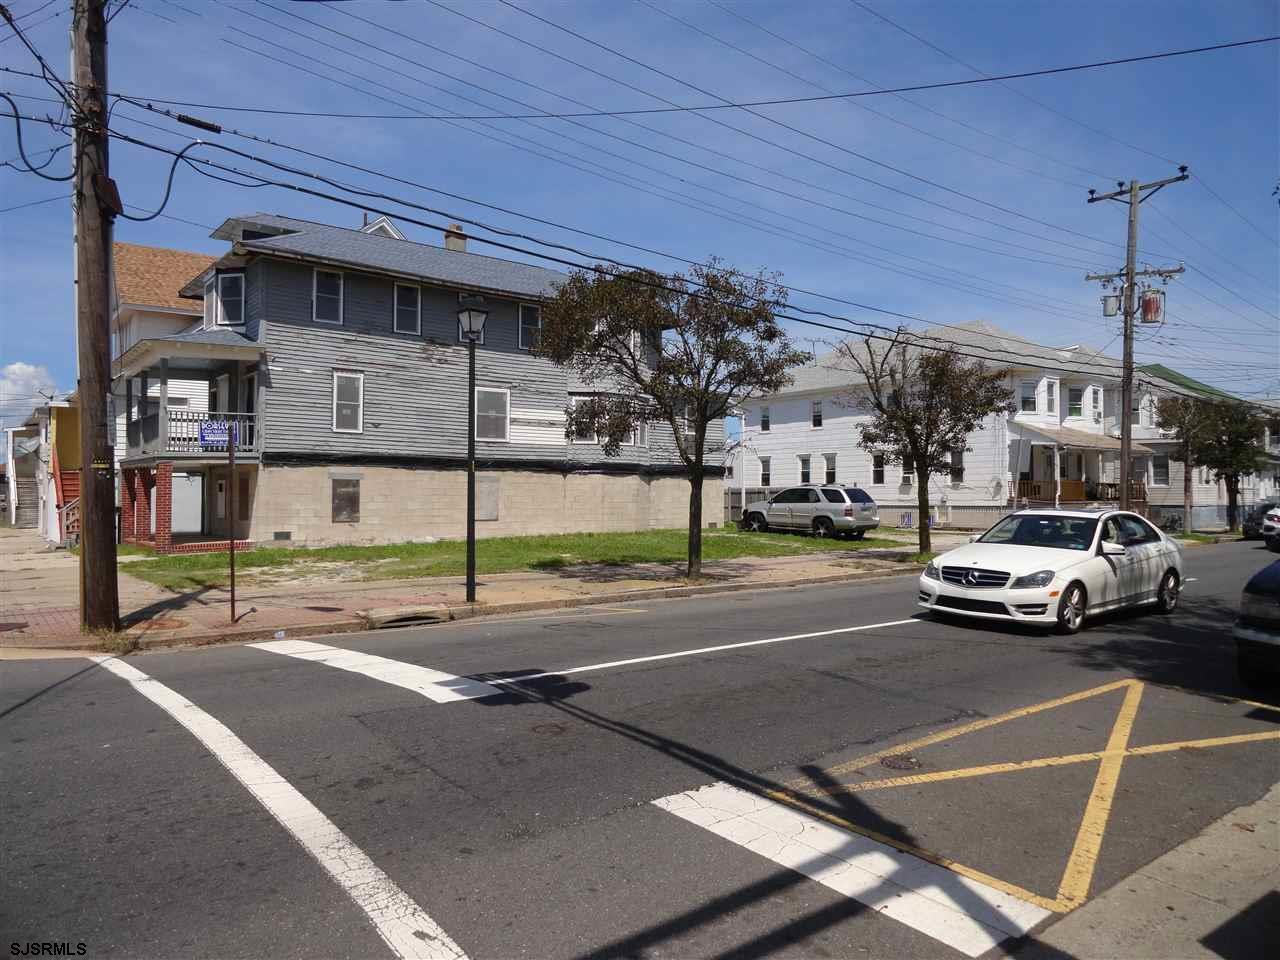 201 N Iowa Ave, Atlantic City, NJ, 08401